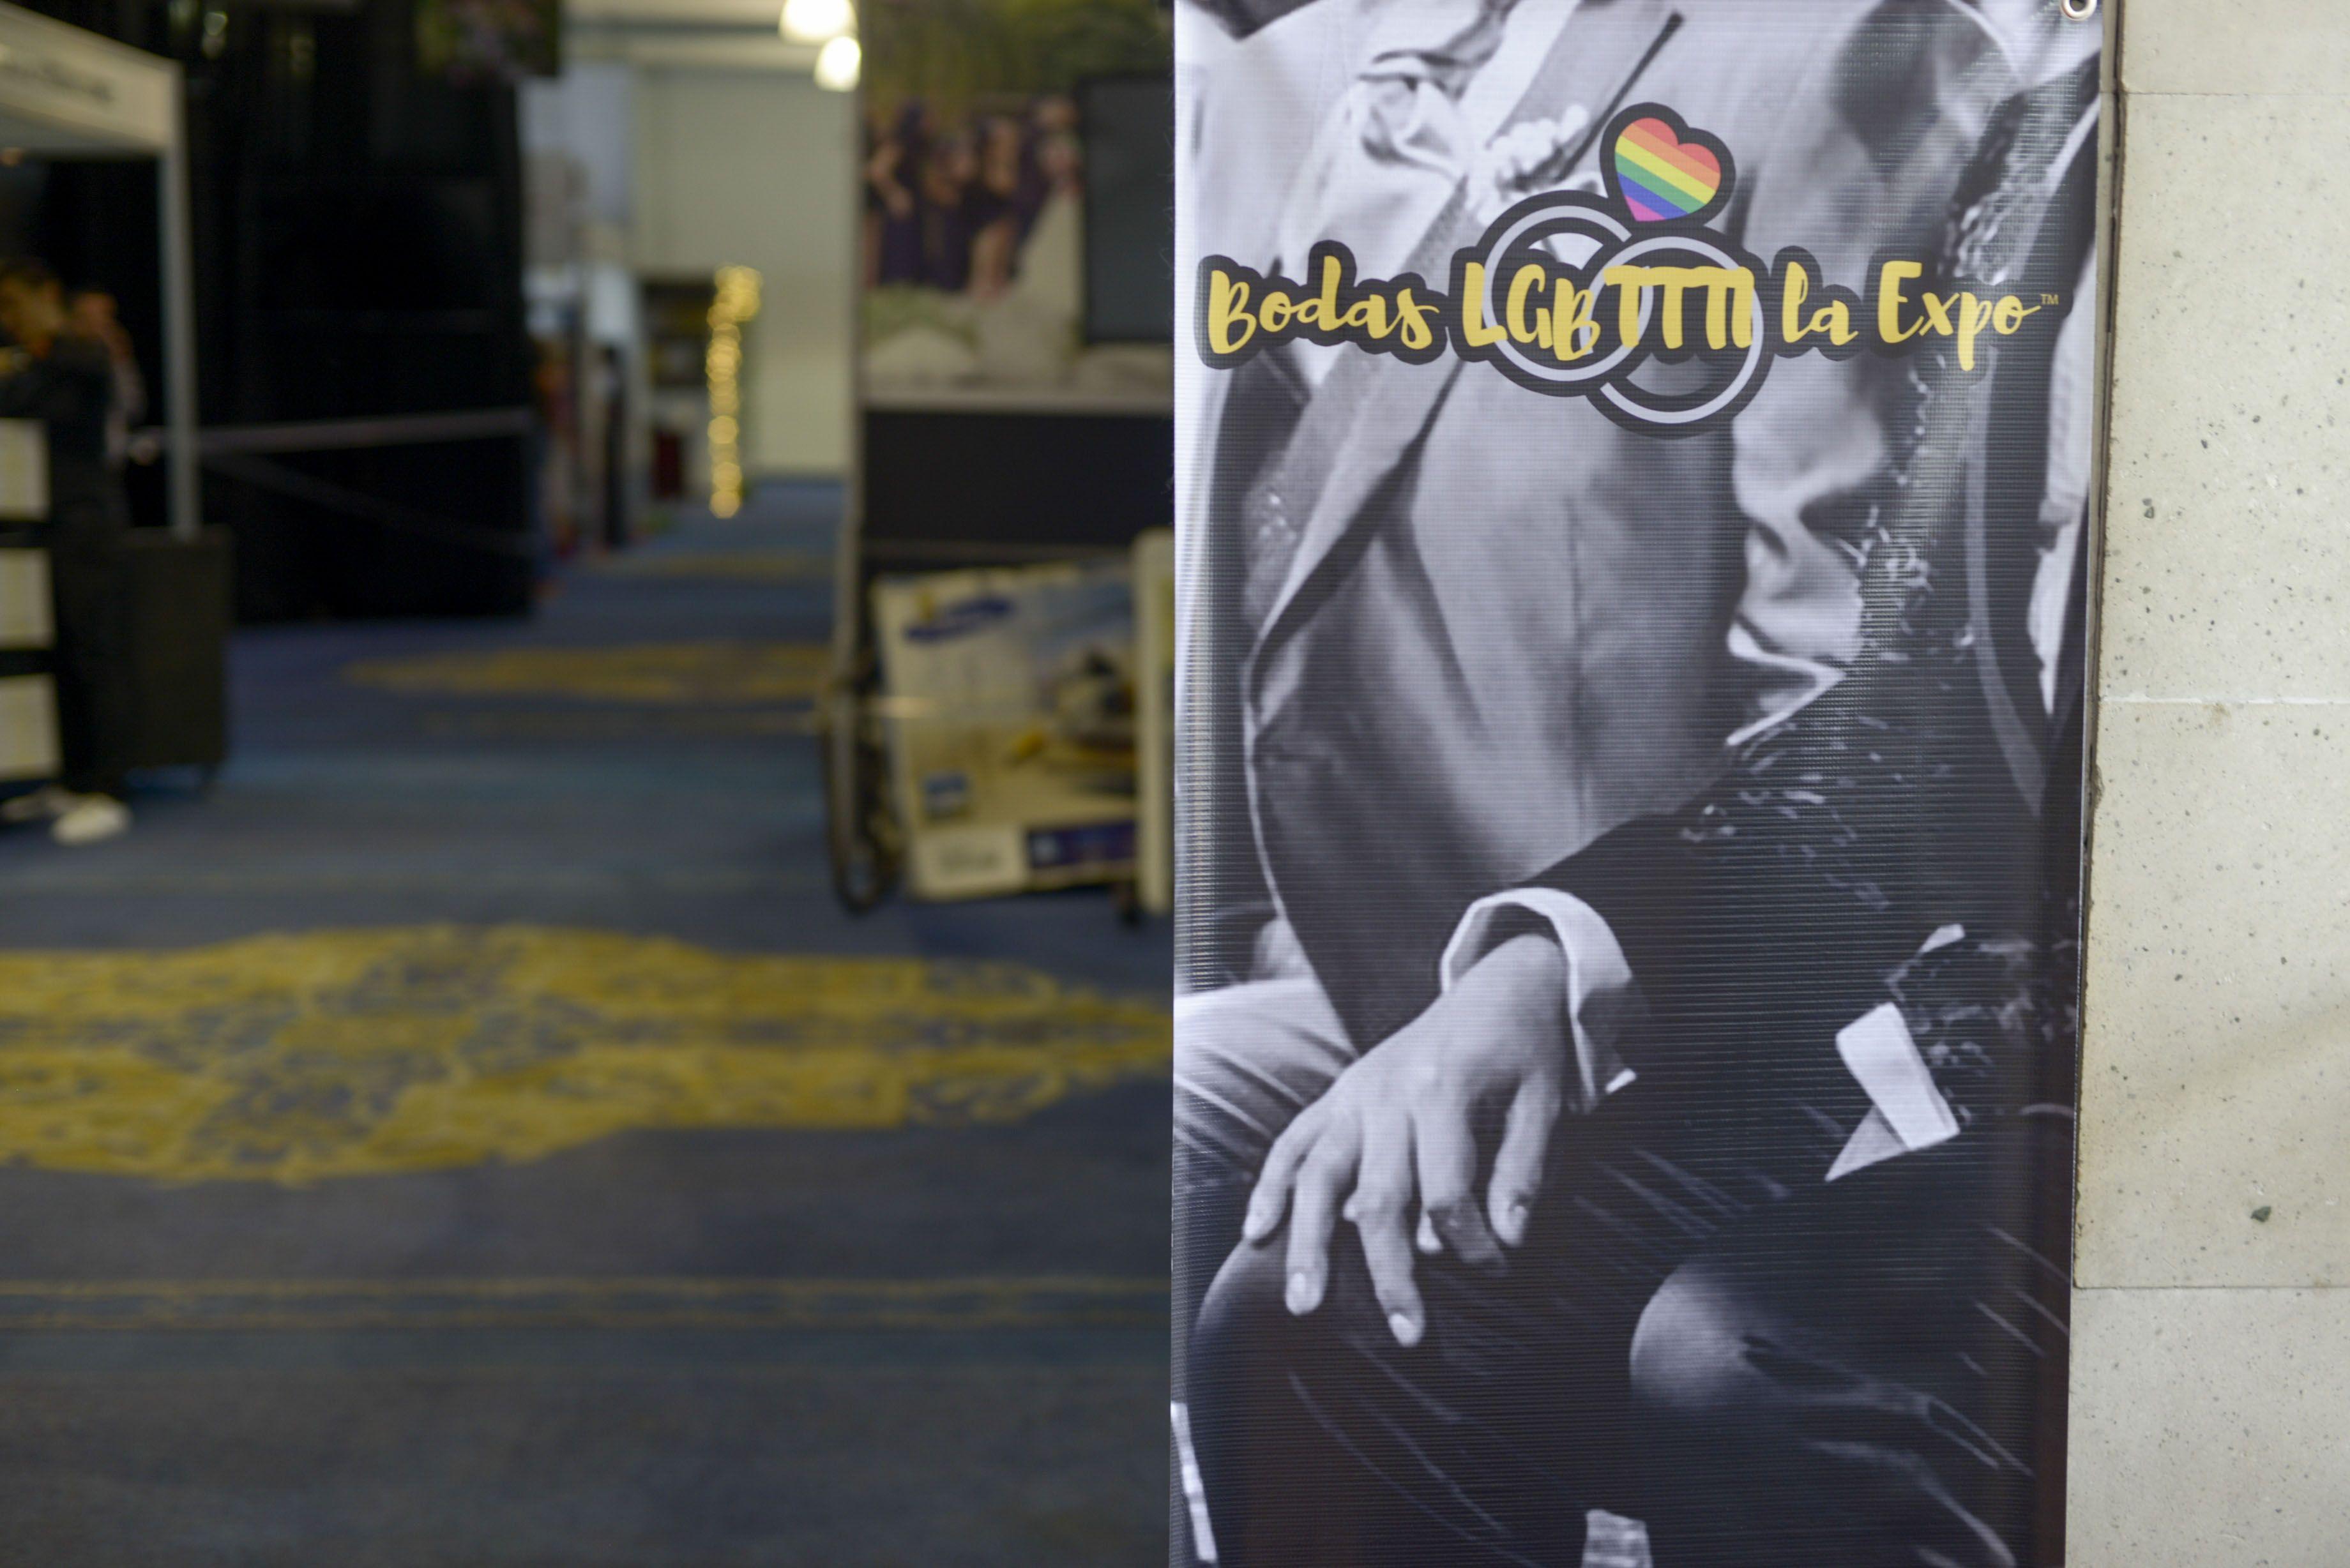 Fotografia Bodas LGBTTTI la Expo